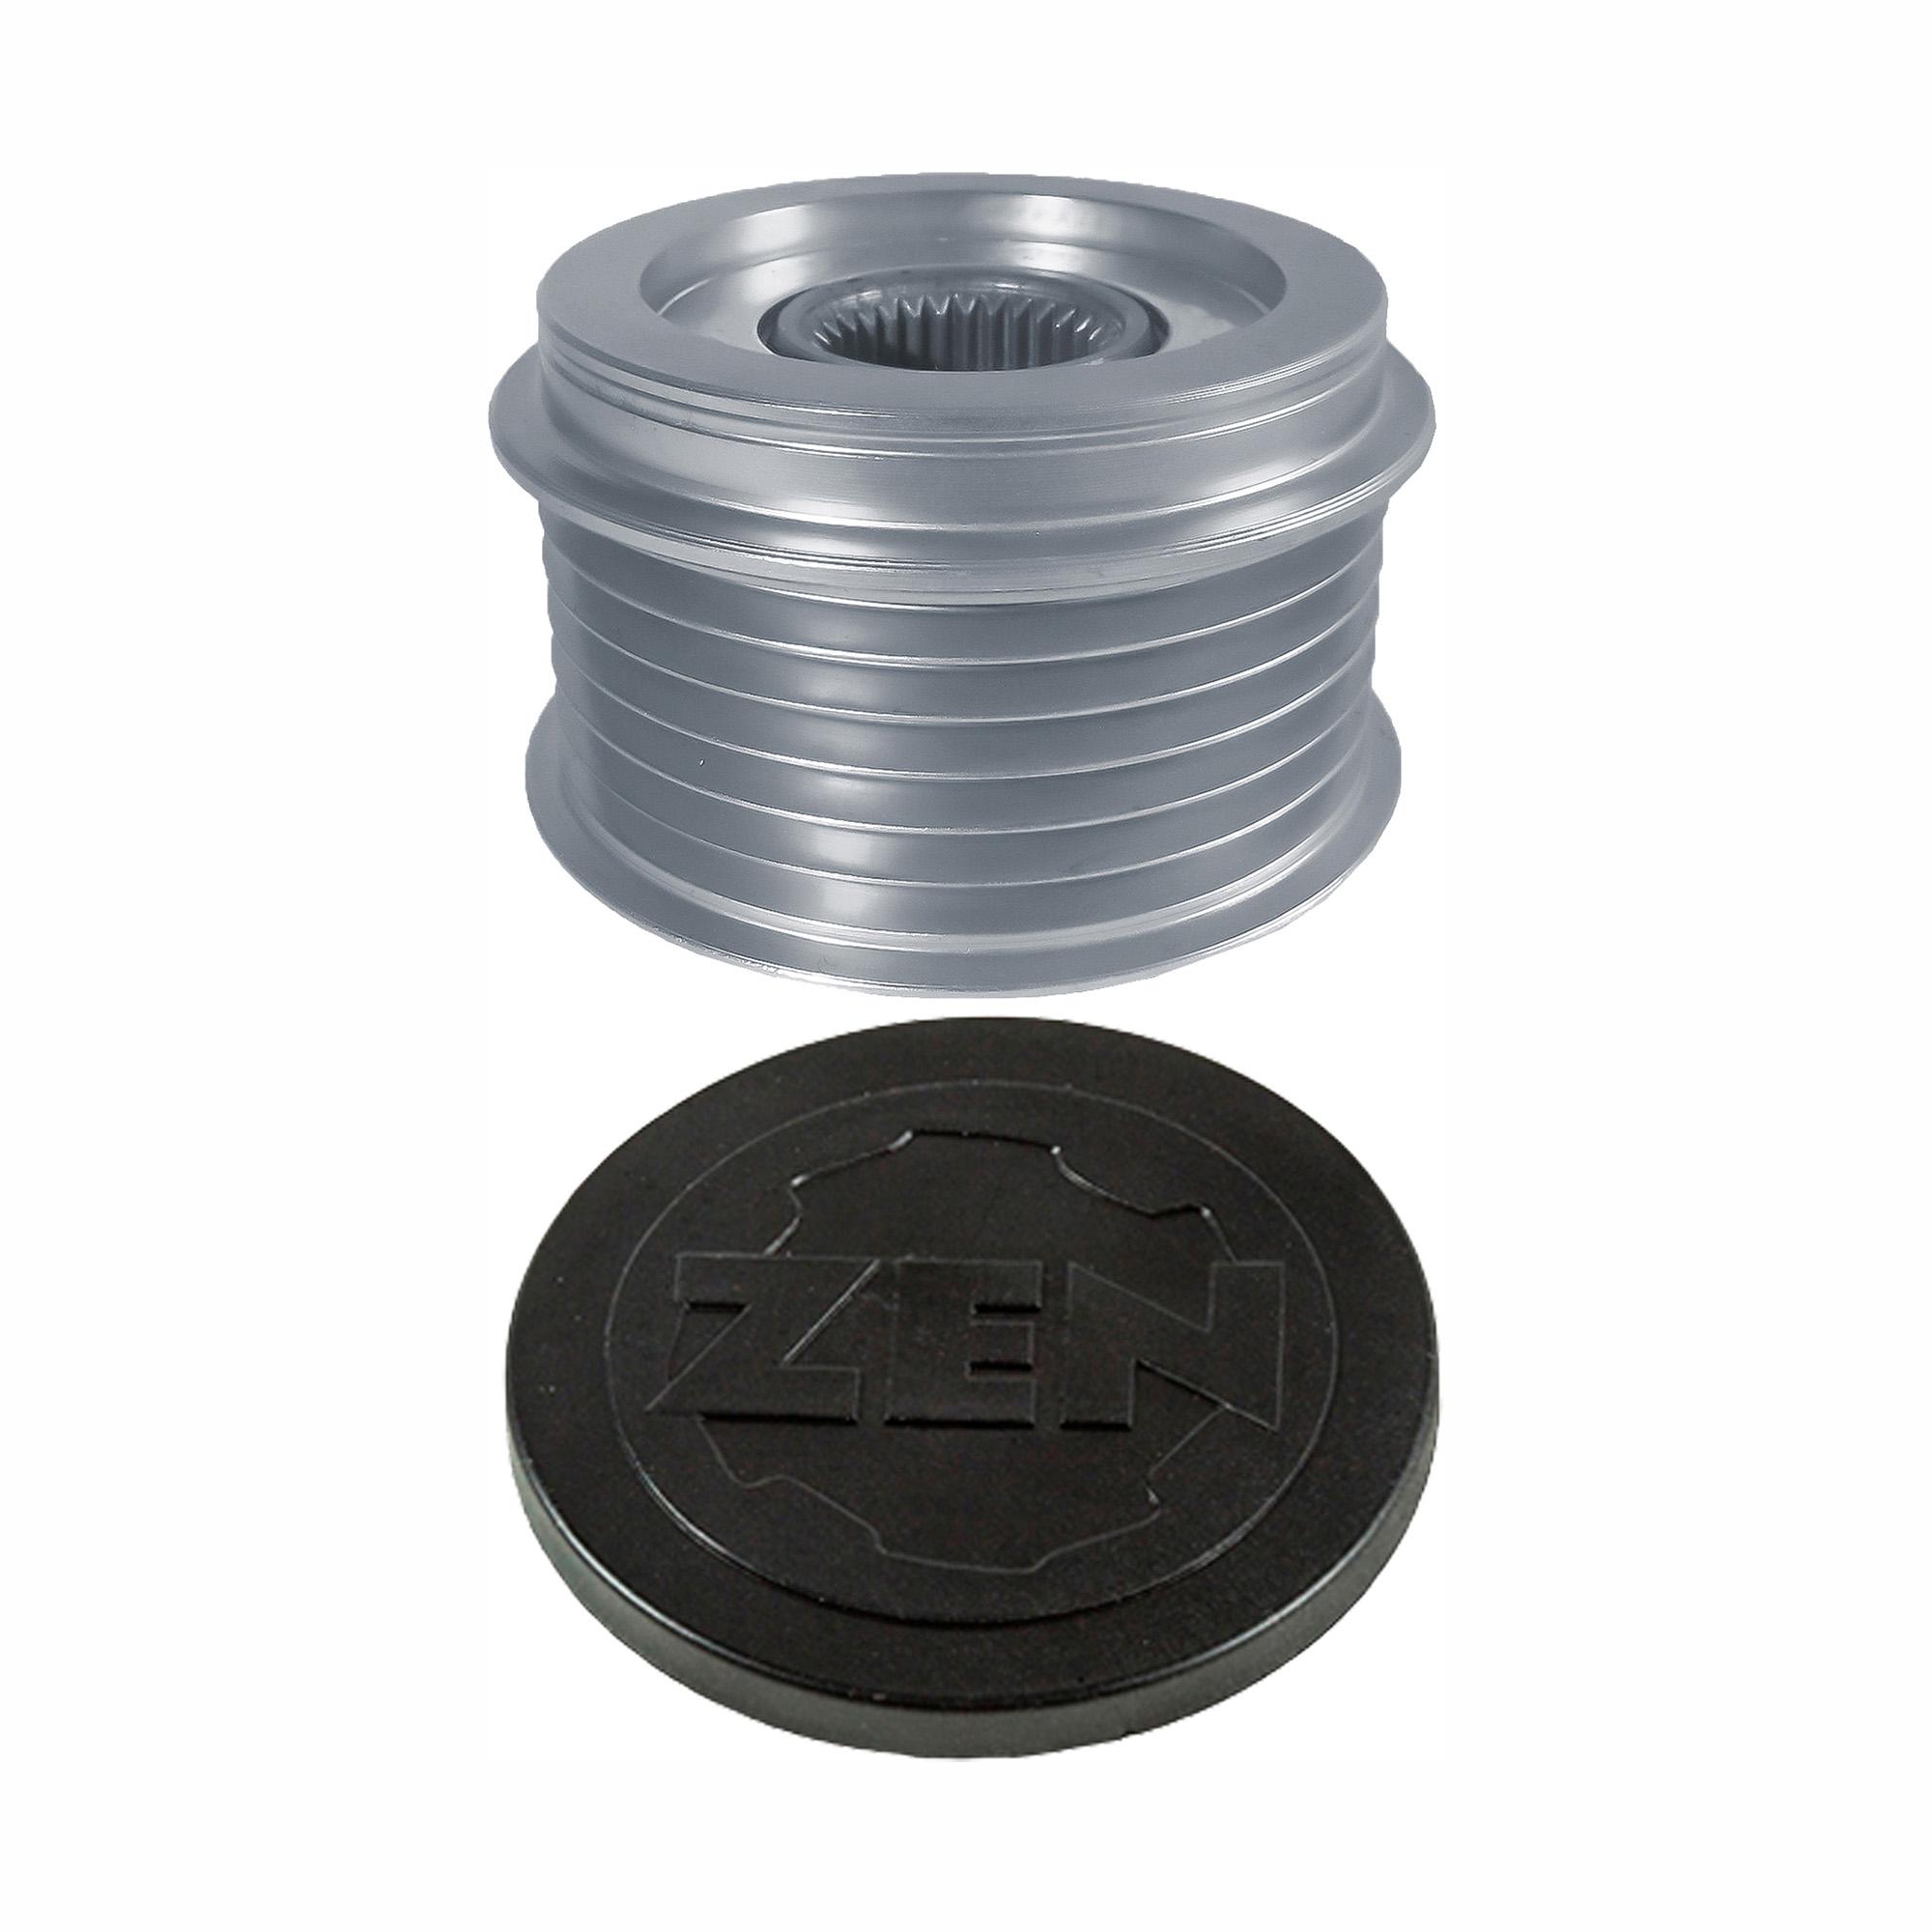 Polia Alternador Roda Livre Audi Touareg (zen5595) - Zen - Peça - Sku: 24866 A4 / A8 / A6 / TOUAREG / A5 / A7 / Q5 / Q7